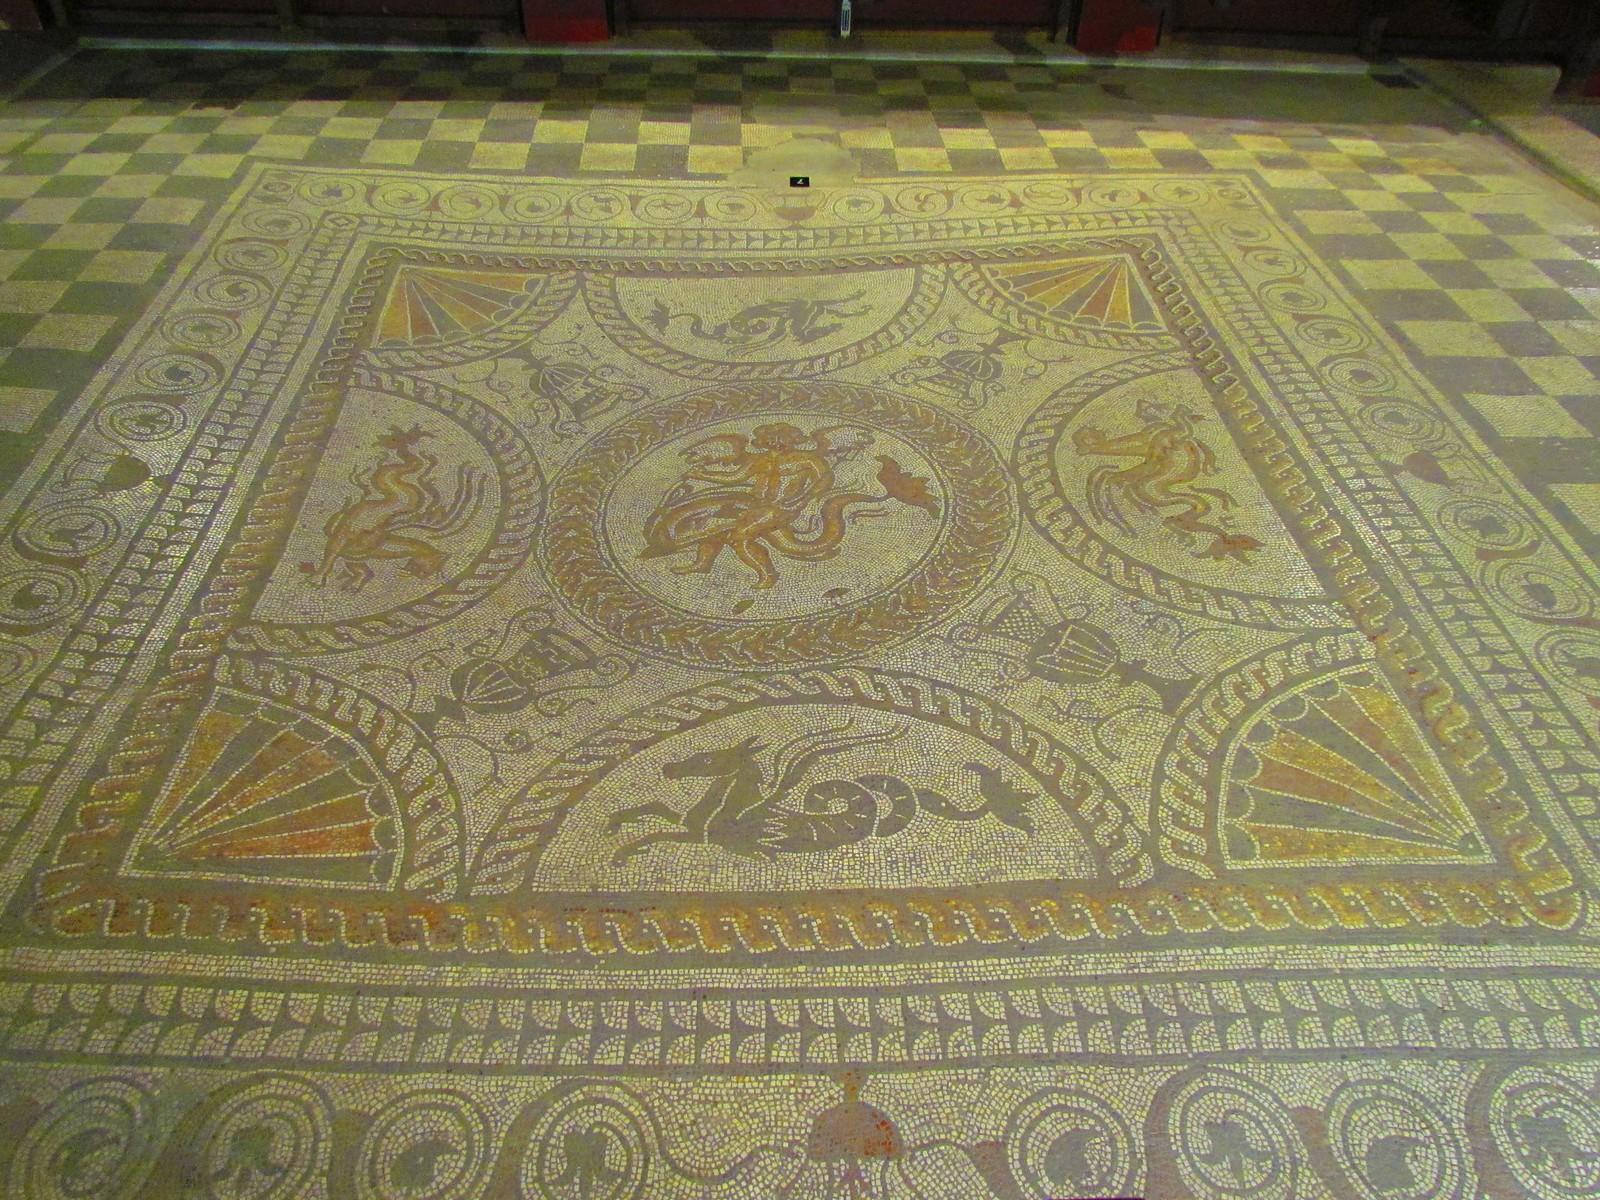 photo from walk Mosaics at Fishbourne Palace